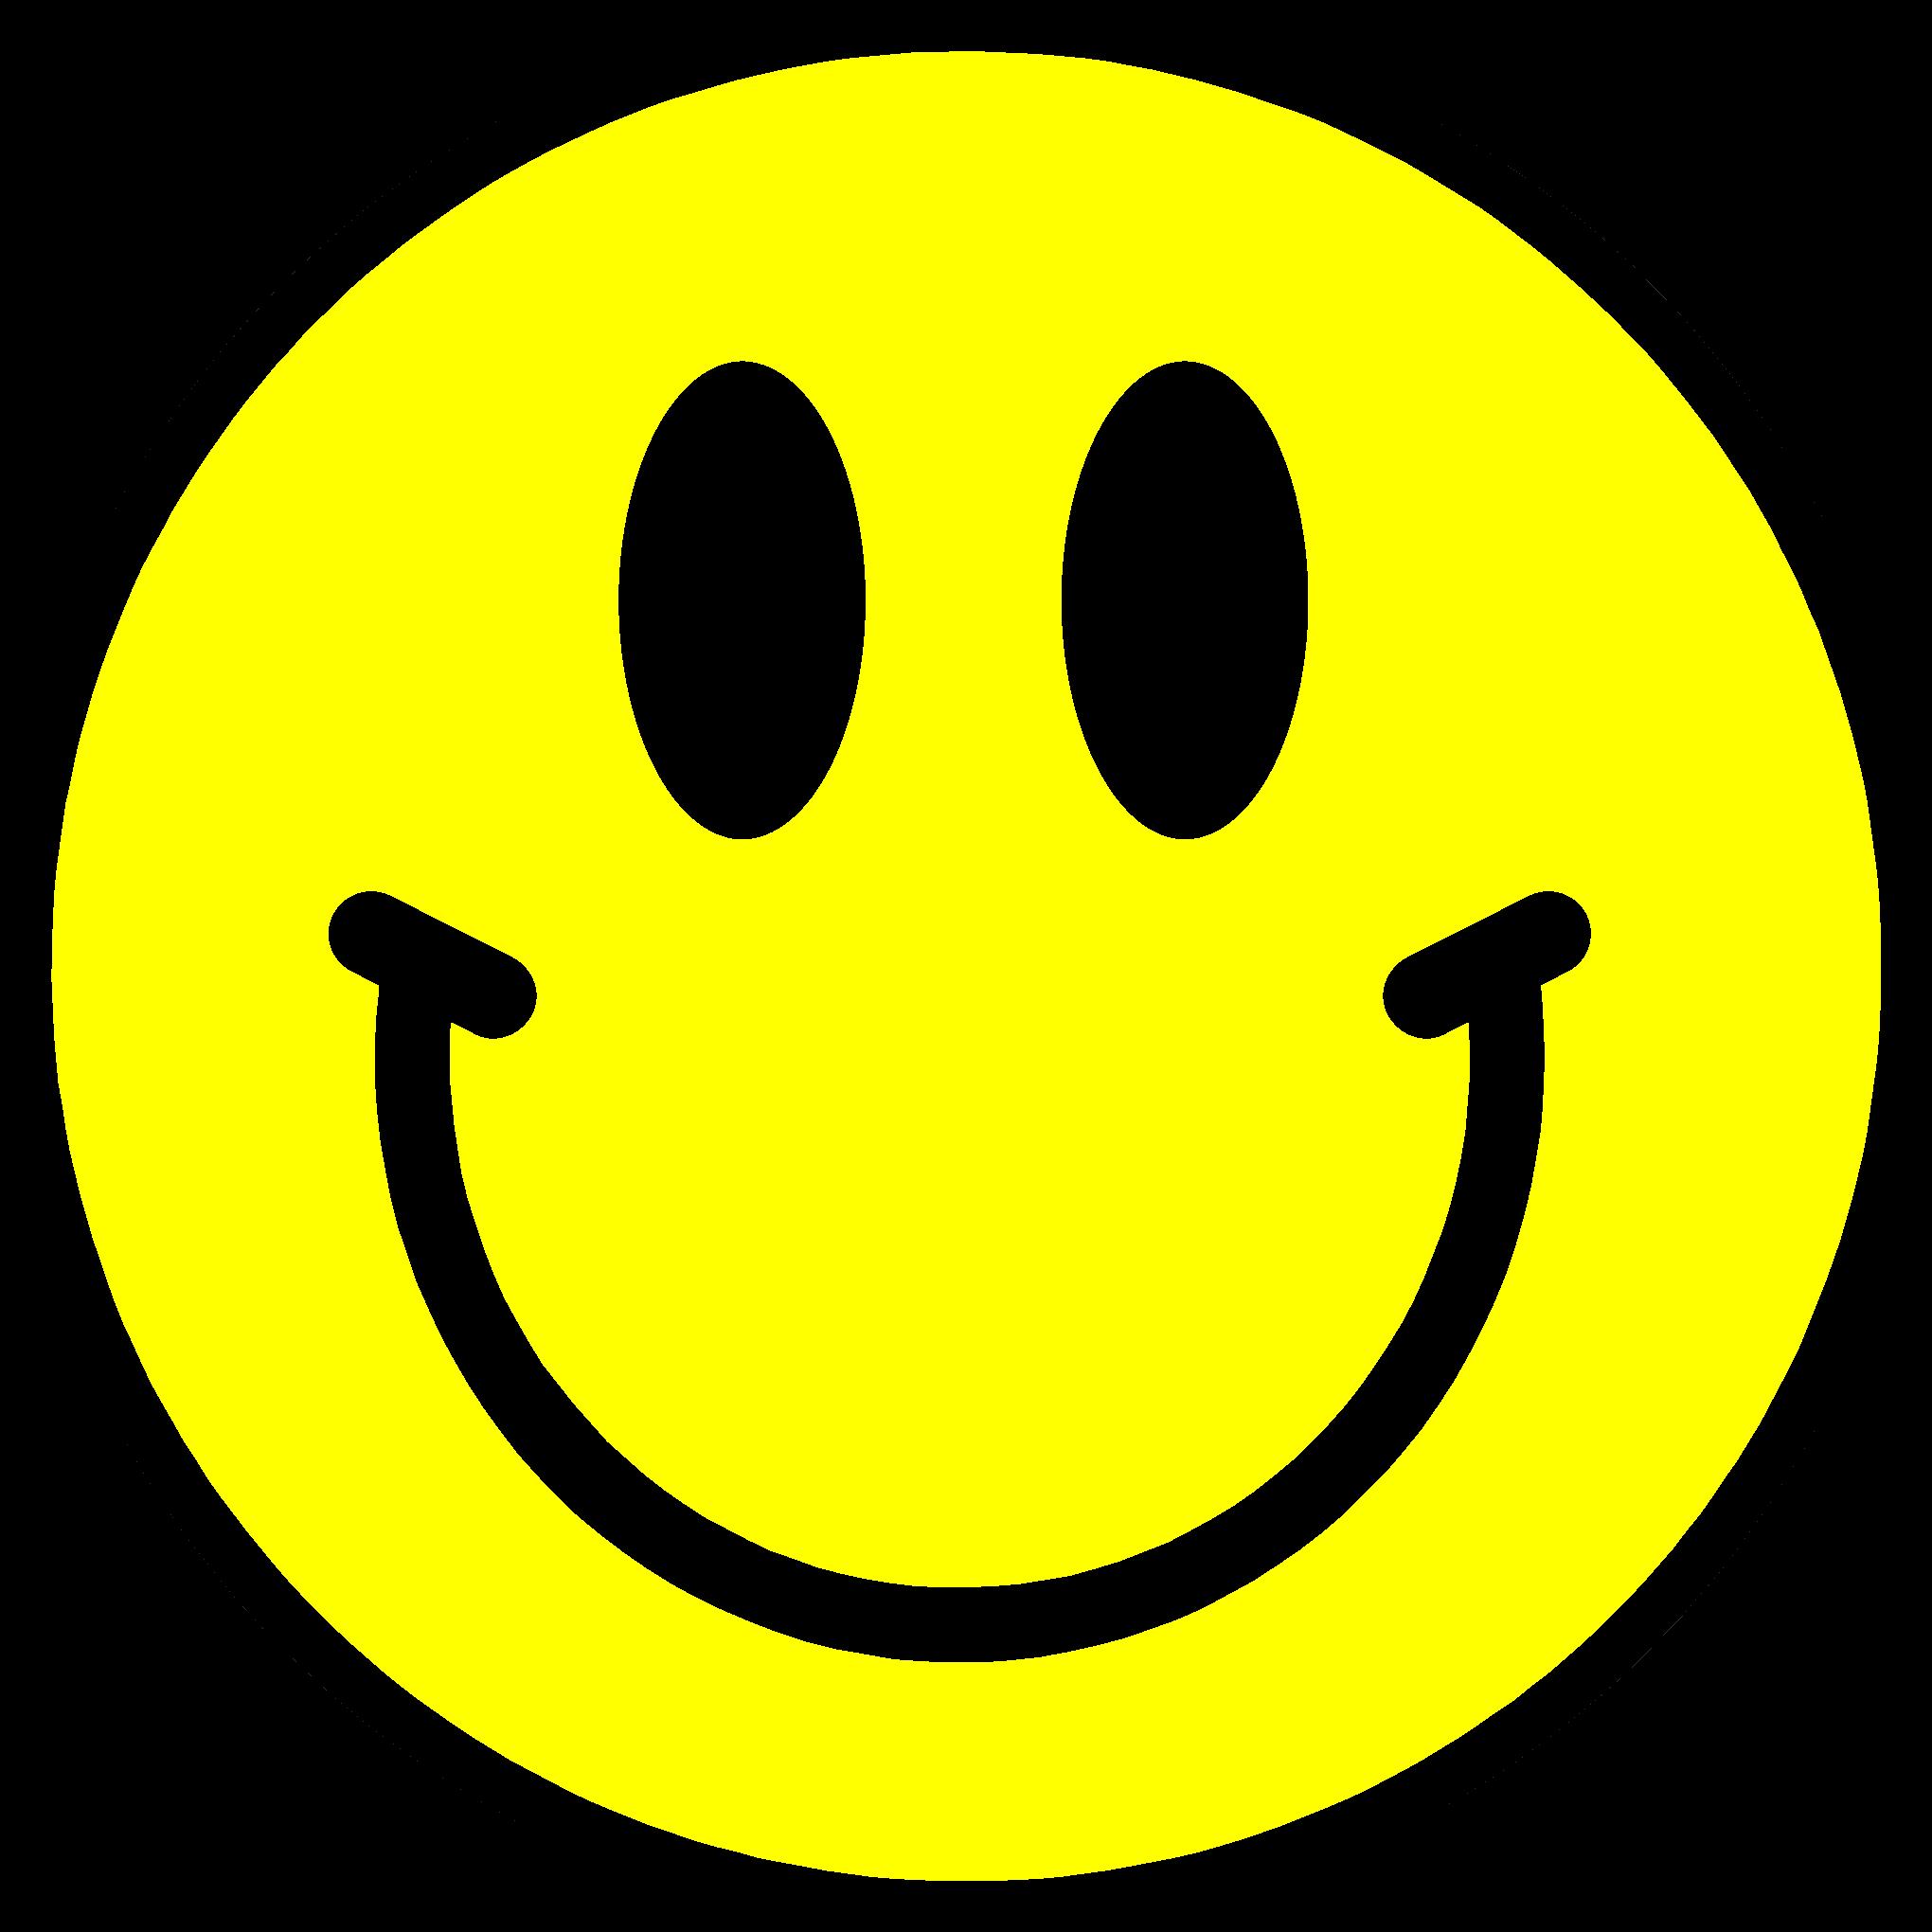 Small Smiley Face Emoji | Images Guru